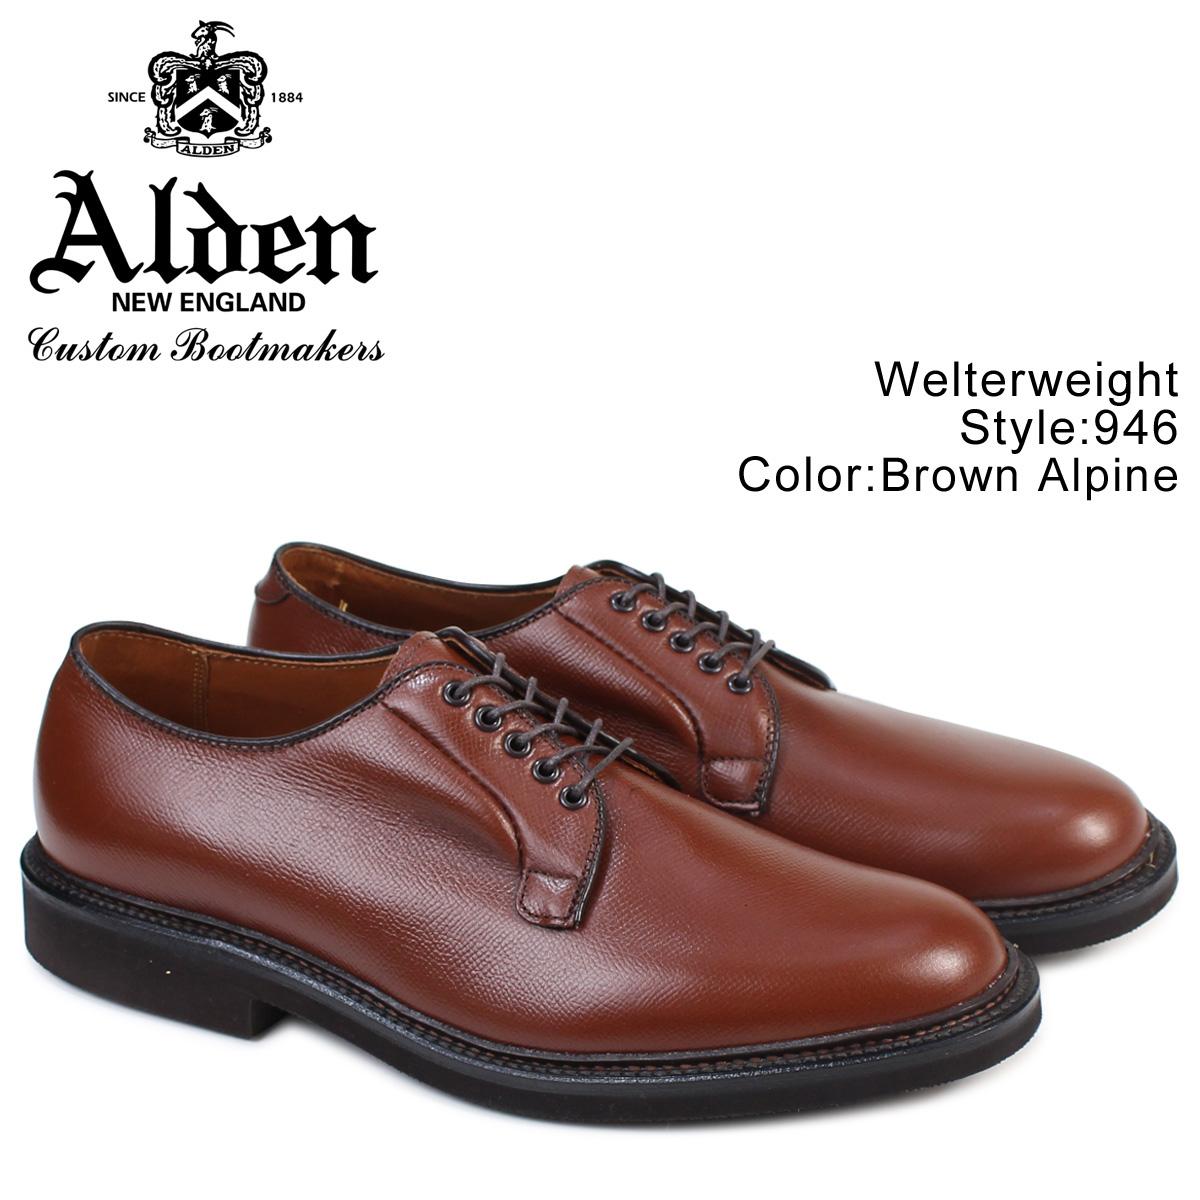 ALDEN オールデン シューズ メンズ WELTERWEIGHT Dワイズ 946